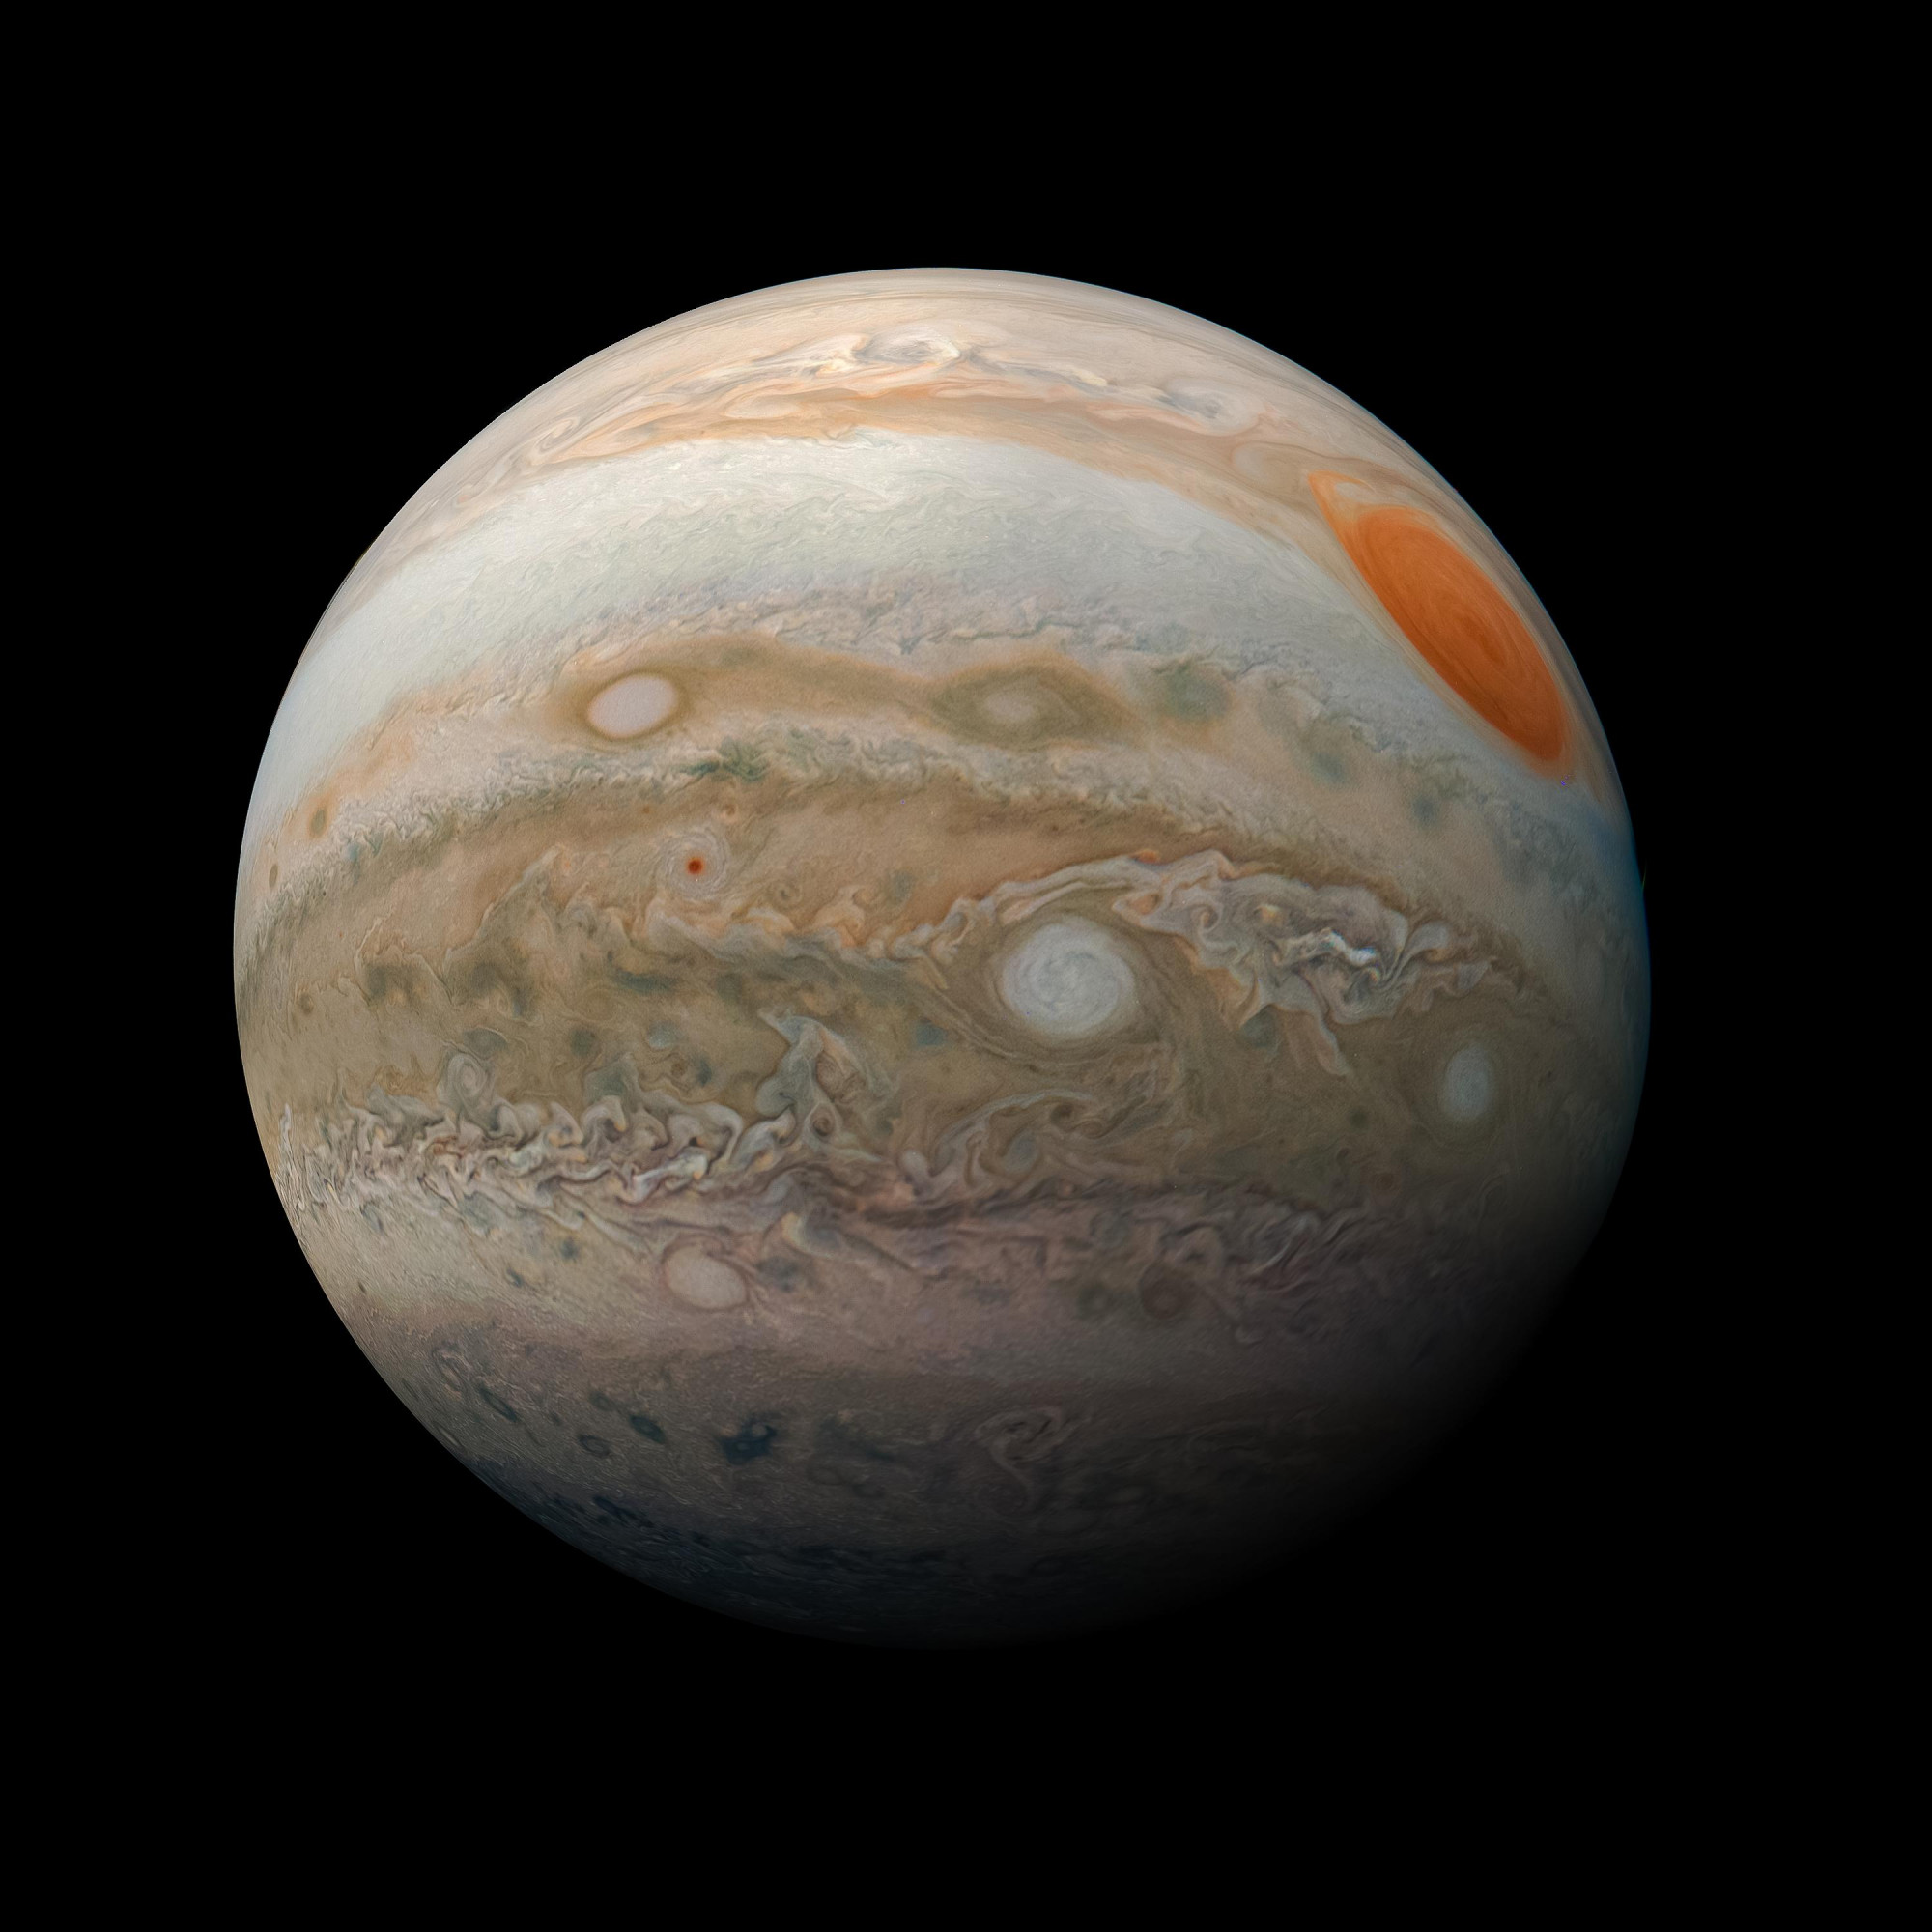 Júpiter (NASA / JPL-Caltech / SwRI / MSSS / Kevin M. Gill)